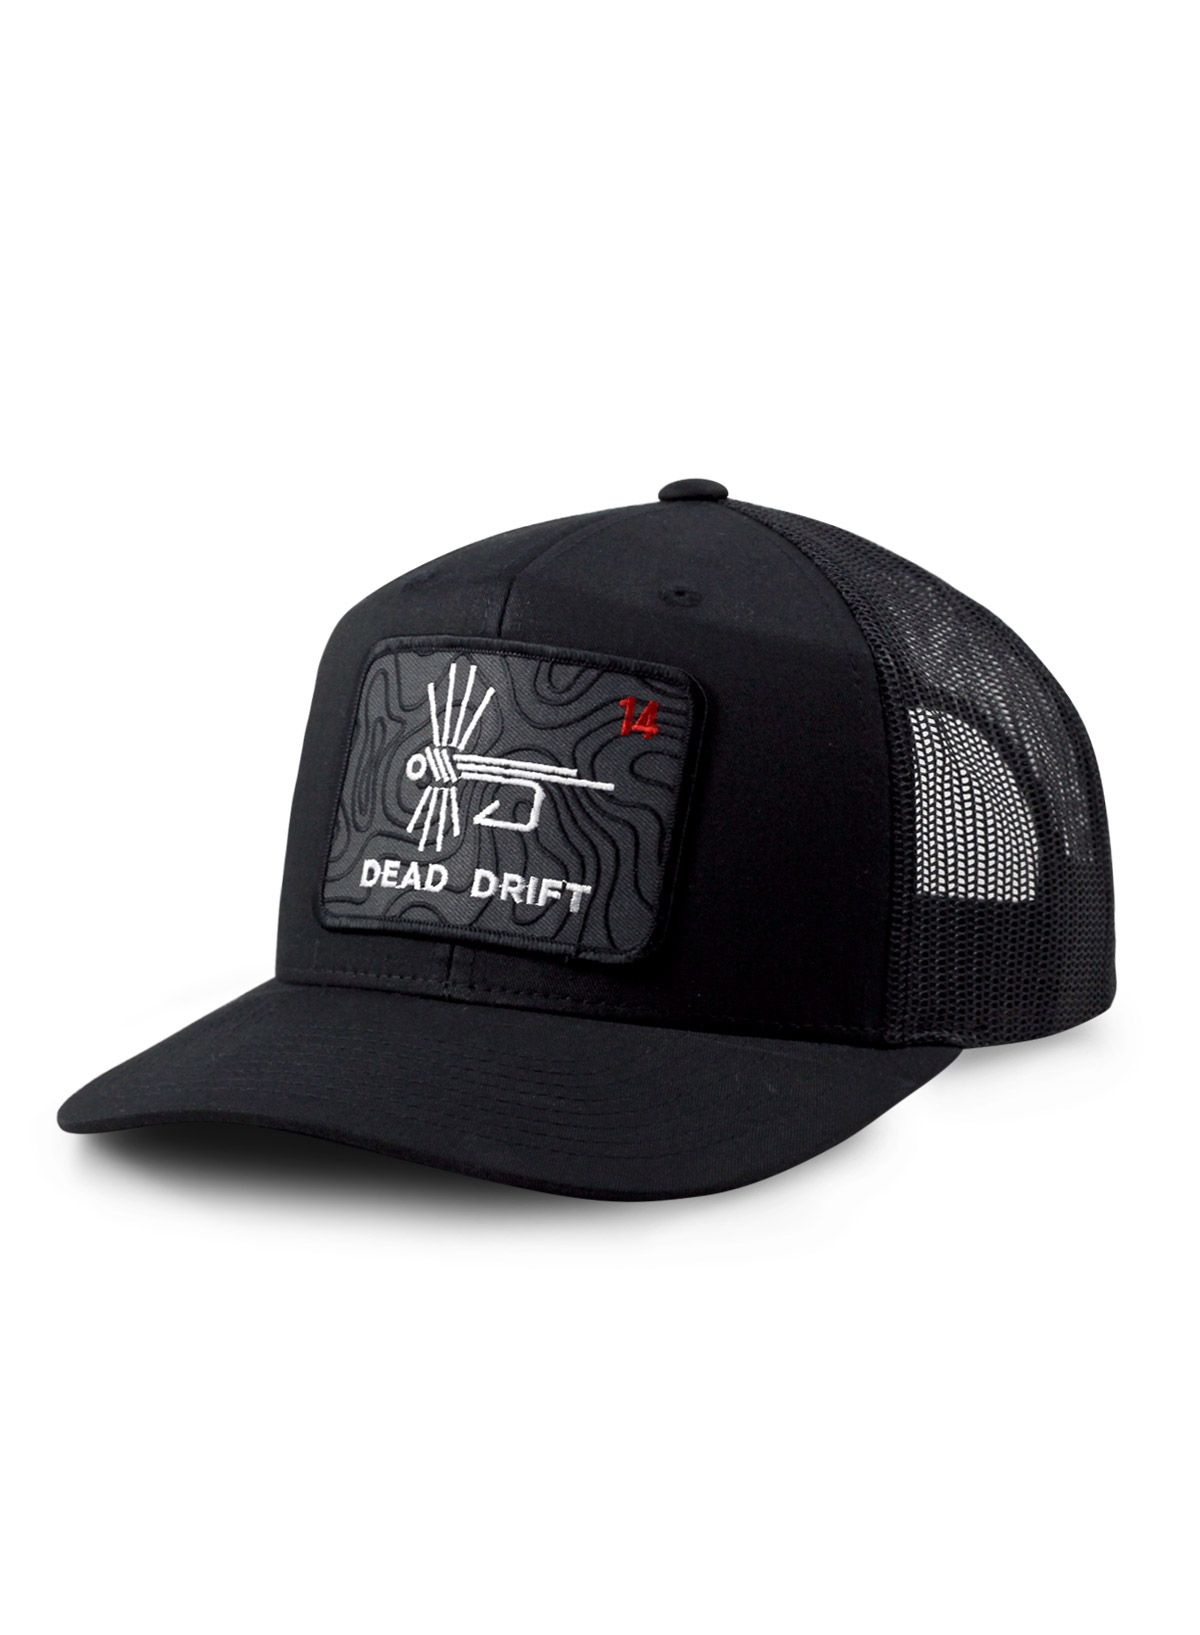 Pin By Lisa On Fly Fishing Hats Fly Fishing Hats Fishing Hat Black Trucker Hat